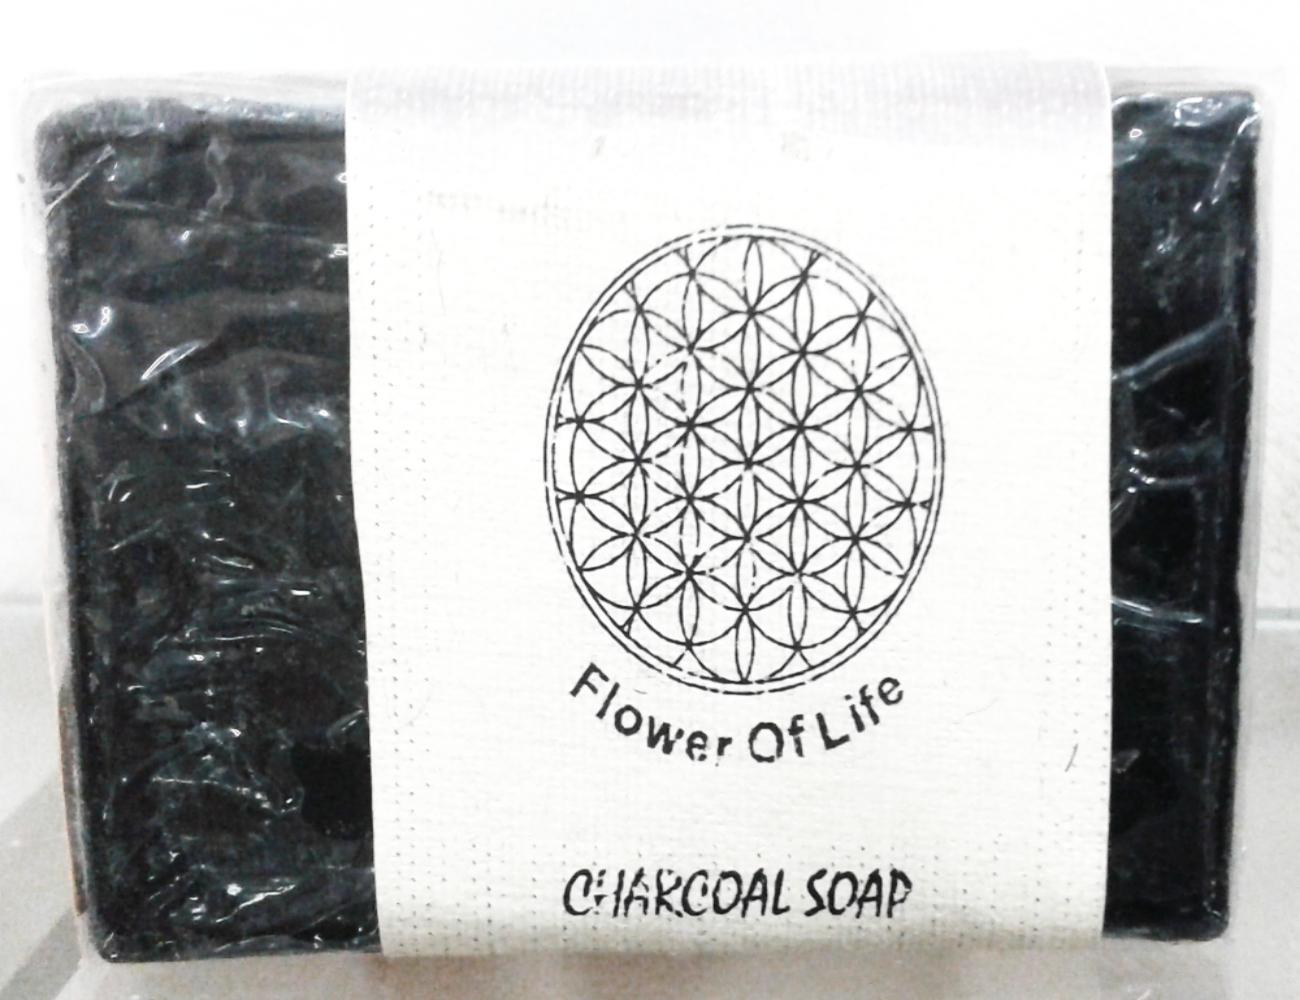 Acne Treatment Charcoal Soap